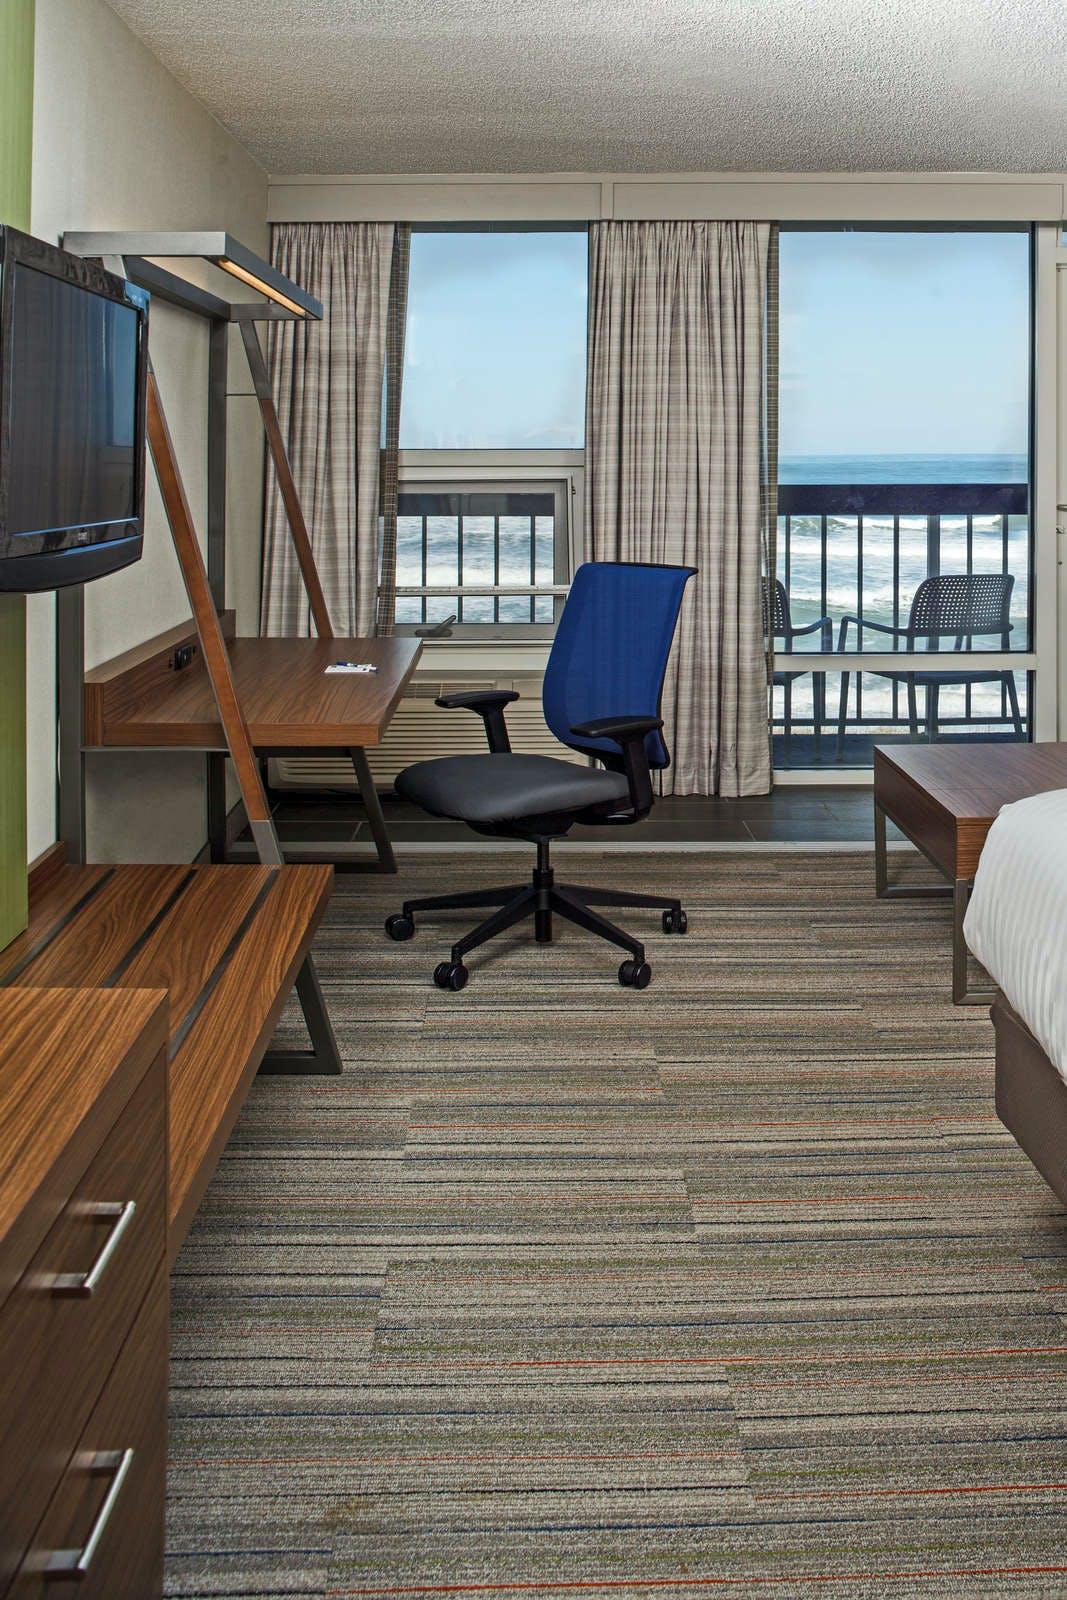 Holiday Inn Express Nags Head Oceanfront